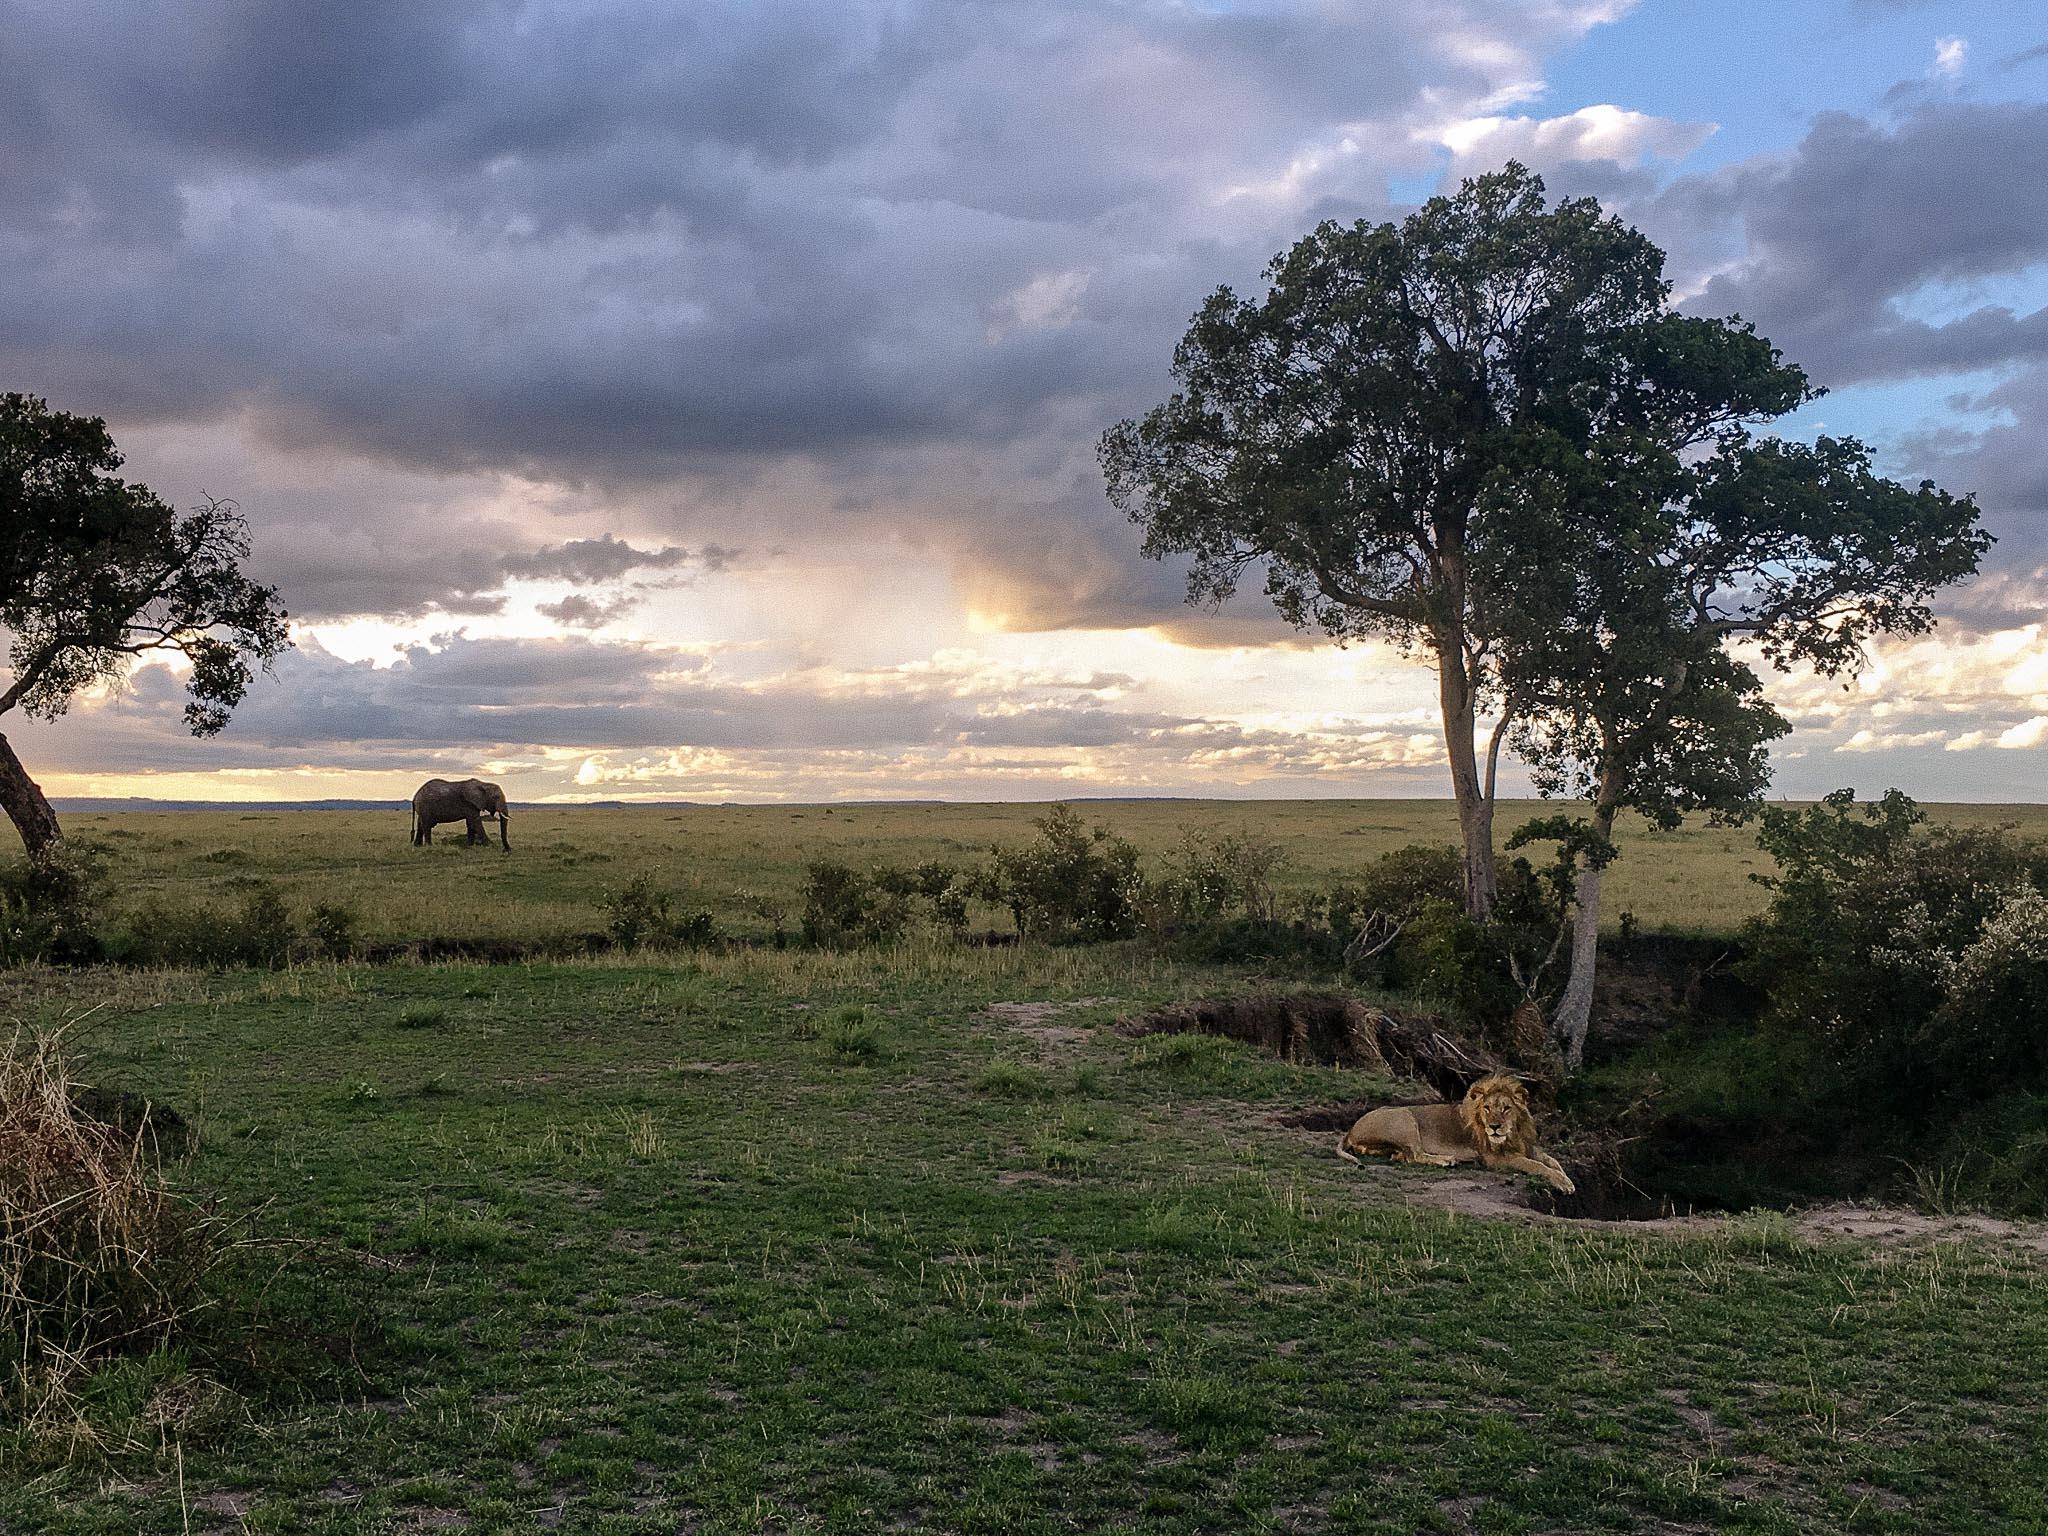 East Africa Honeymoon Safari